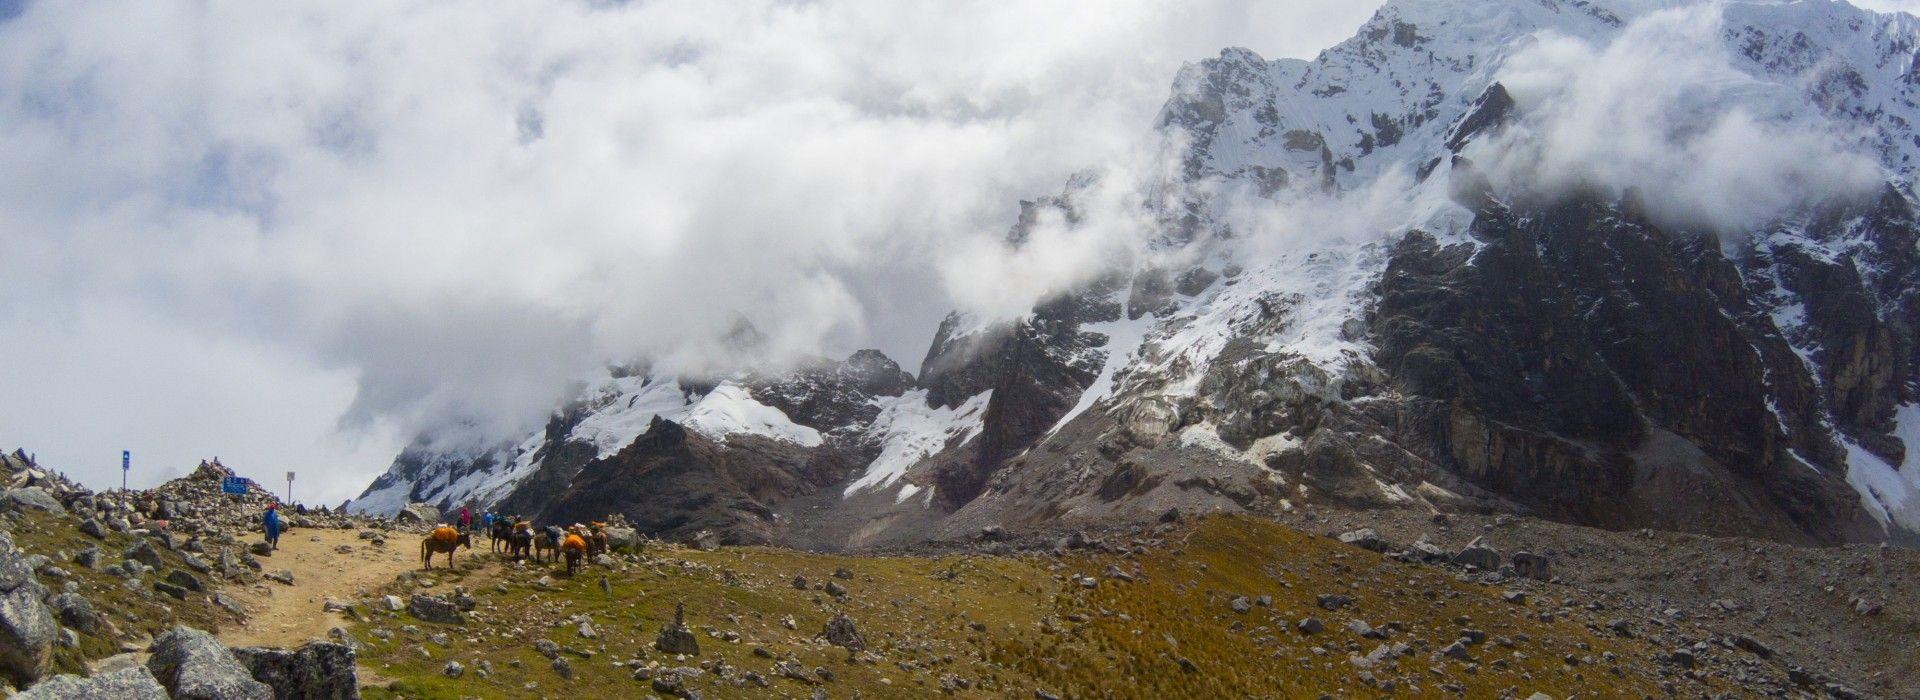 Trekking Tours in Salkantay